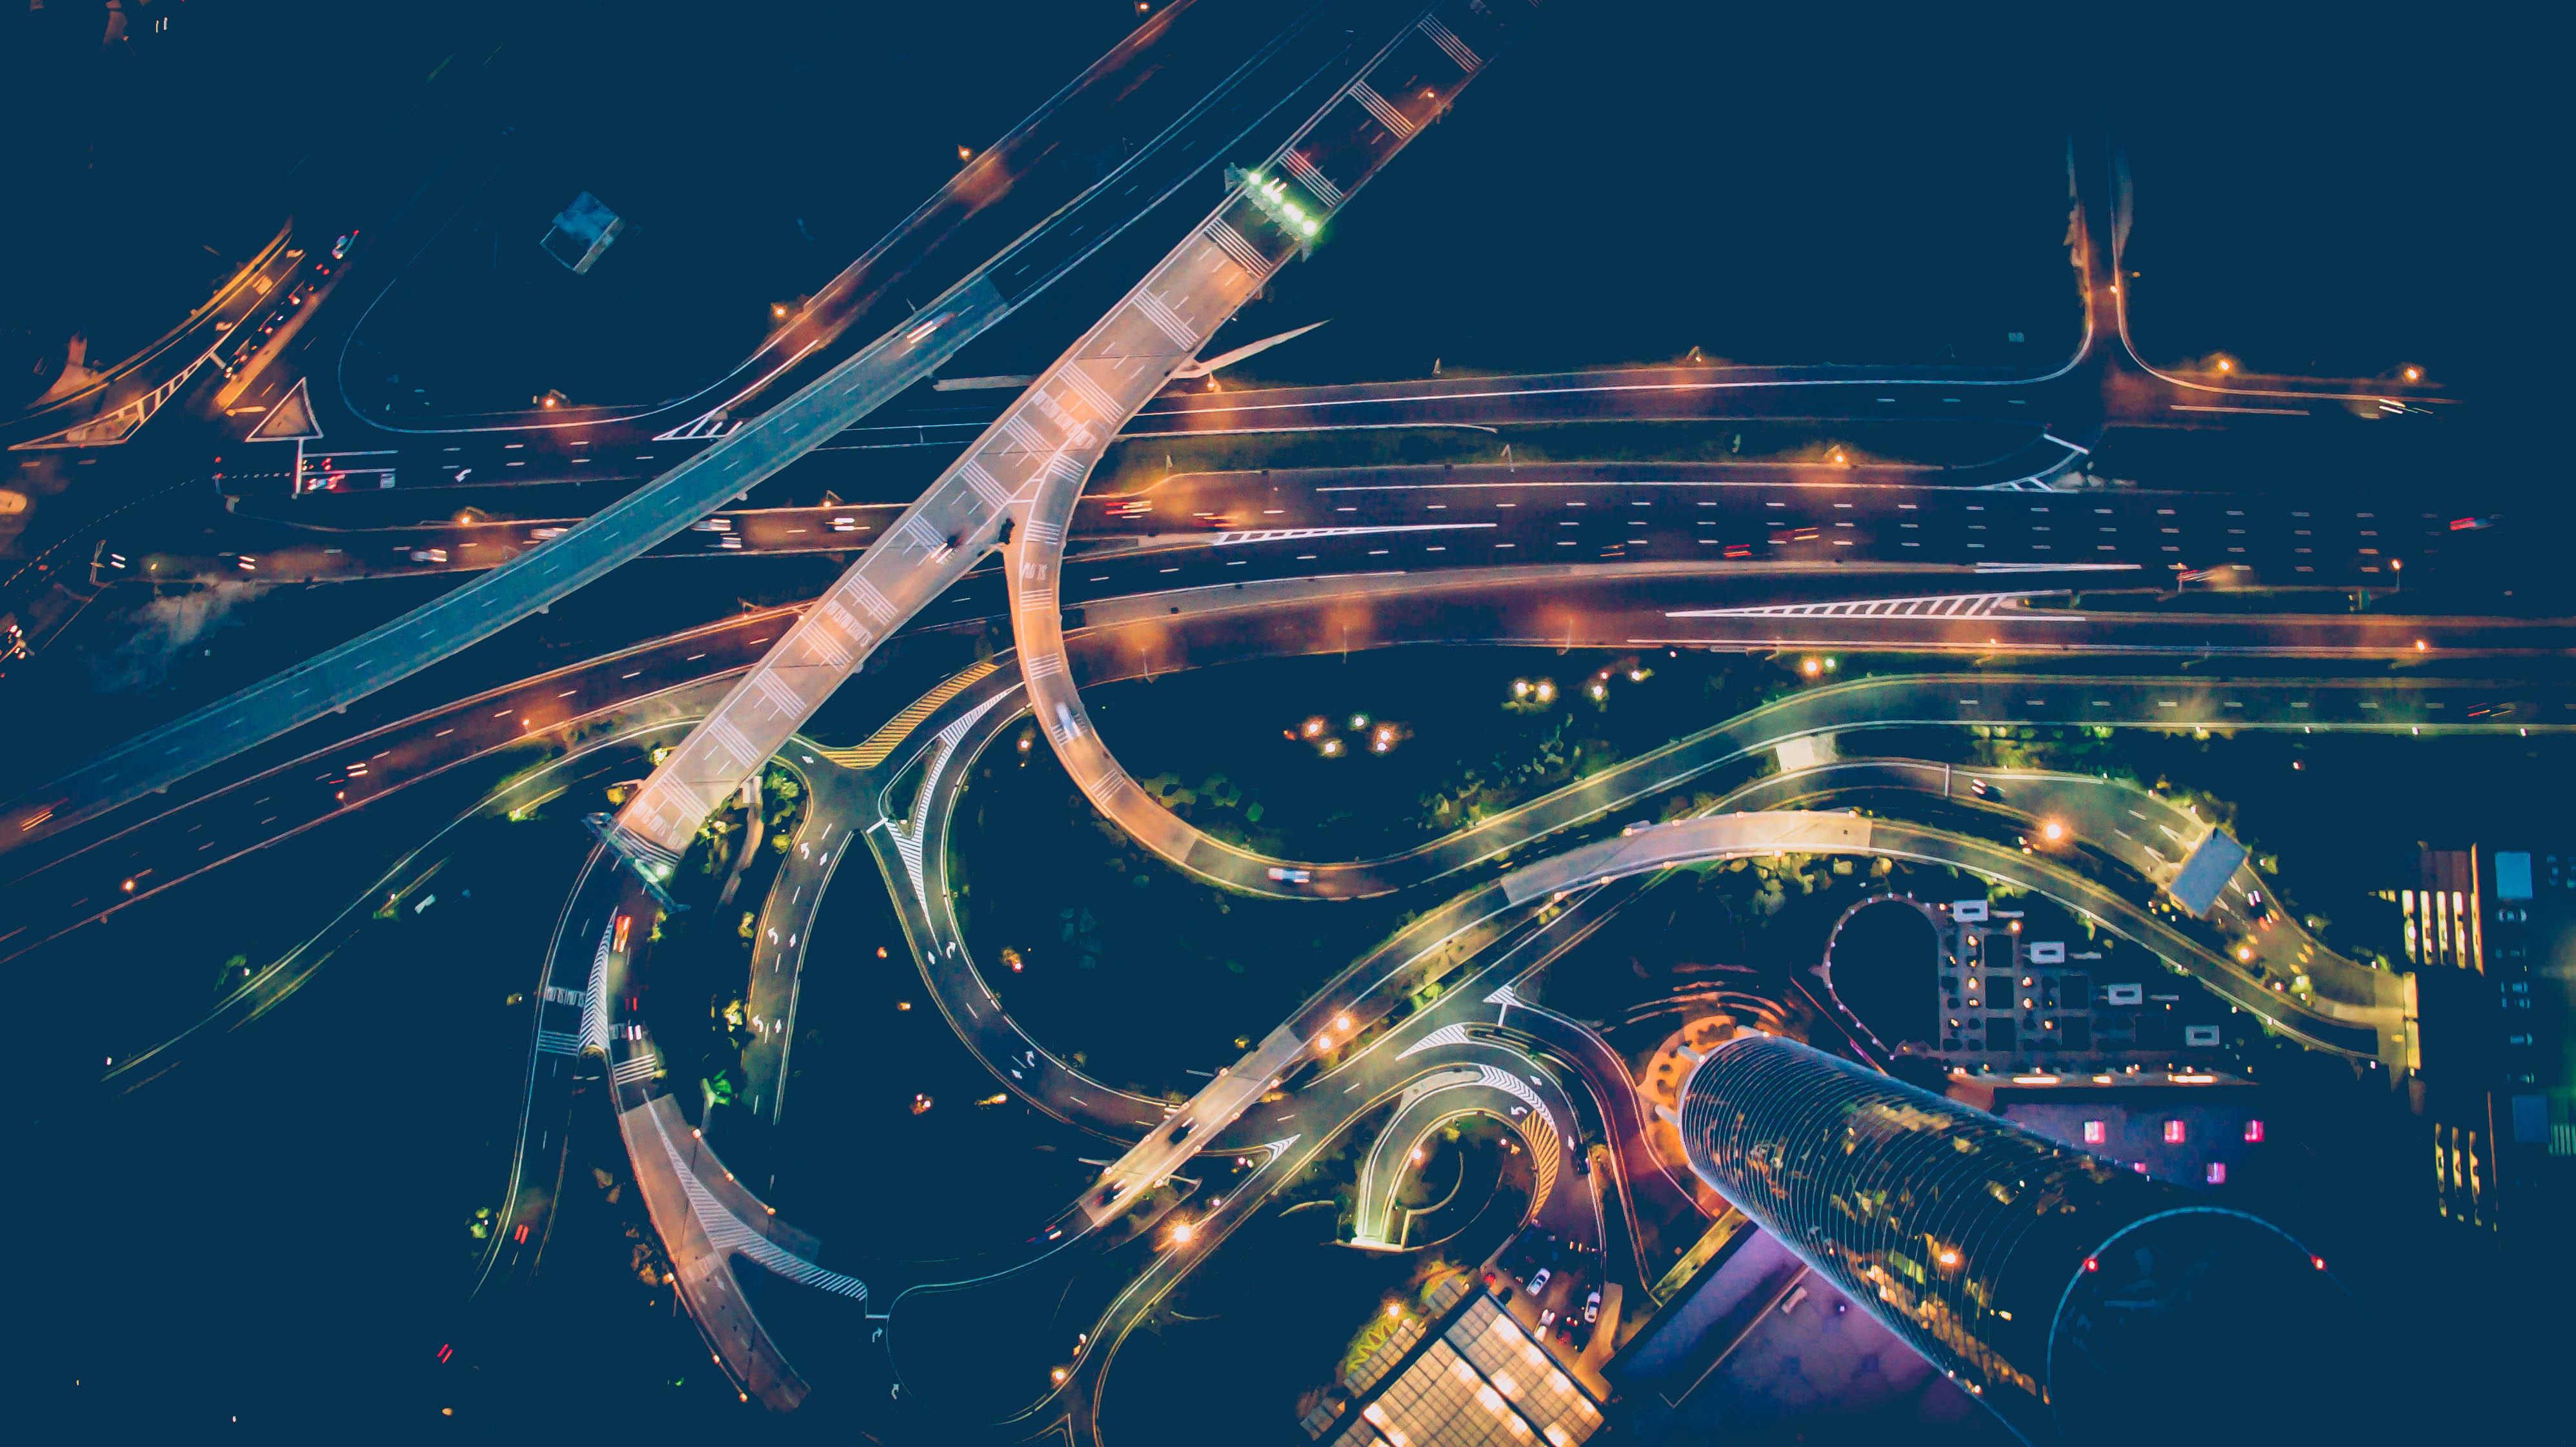 Road junction at night illuminated by street lights